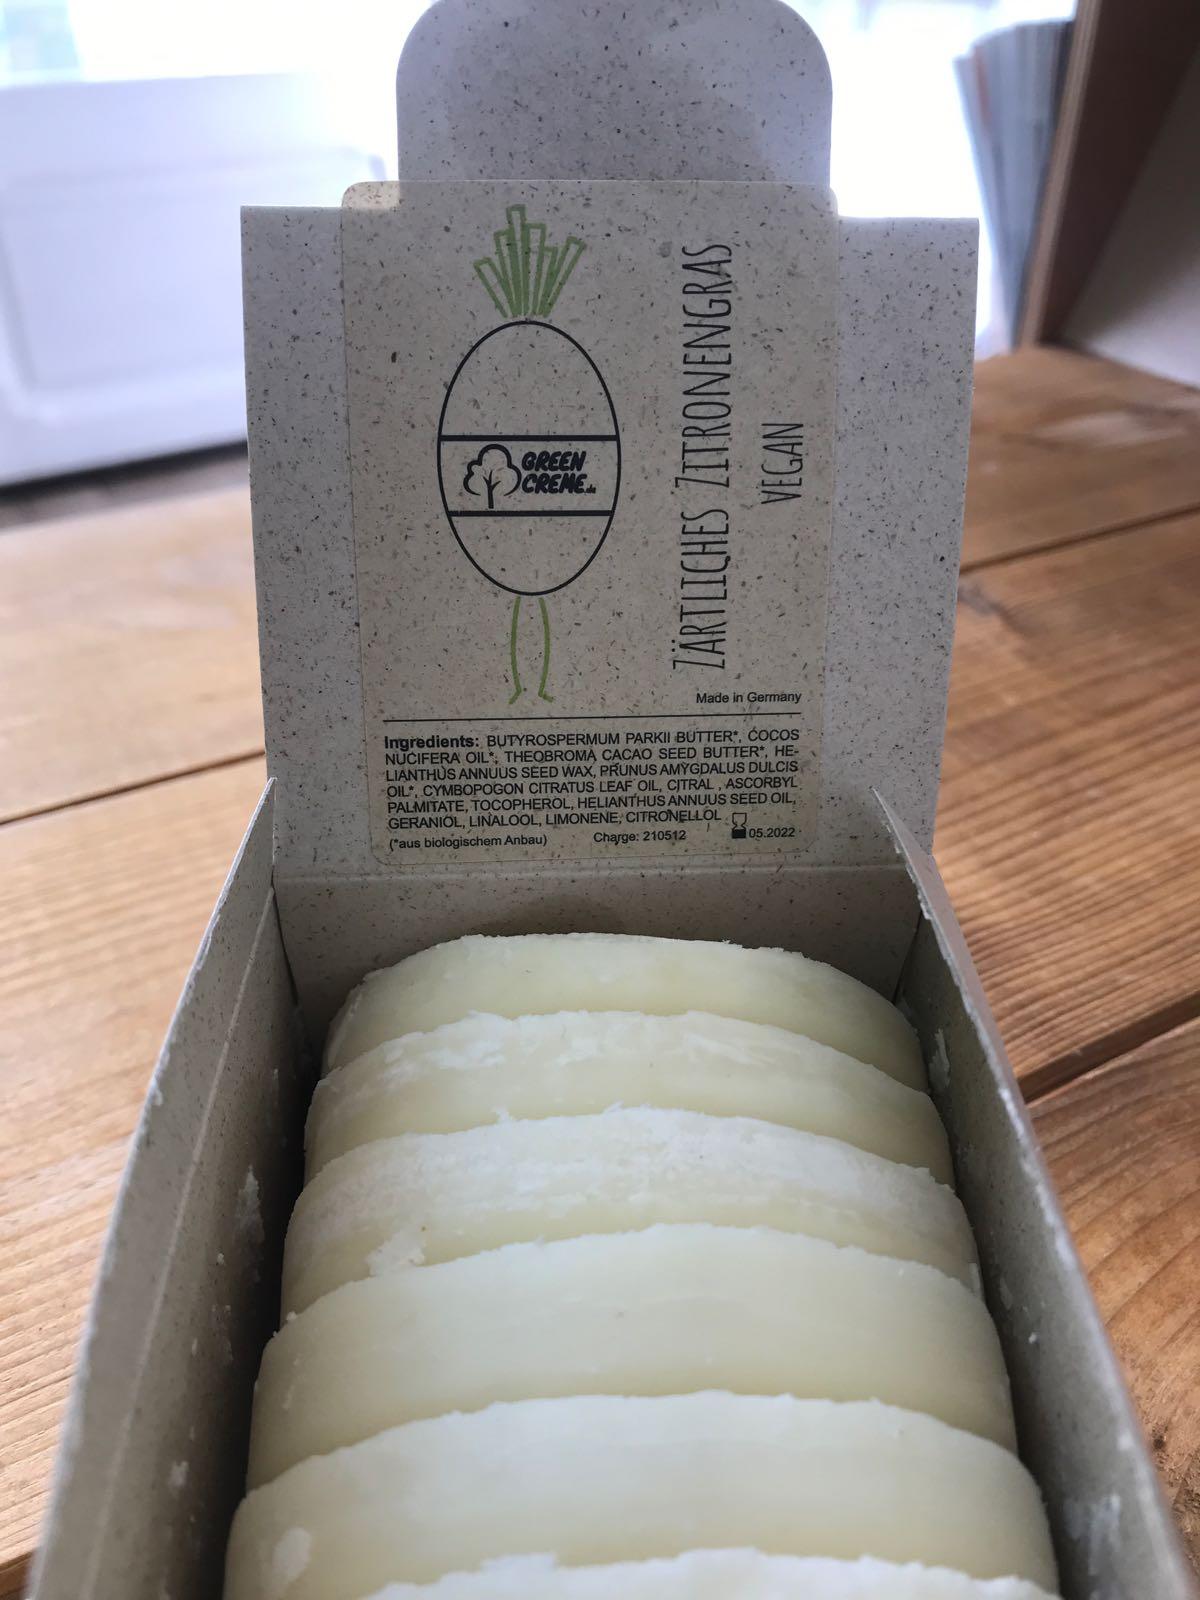 feste Handcreme Zitronengras, VEGAN, unverpackt, Bio